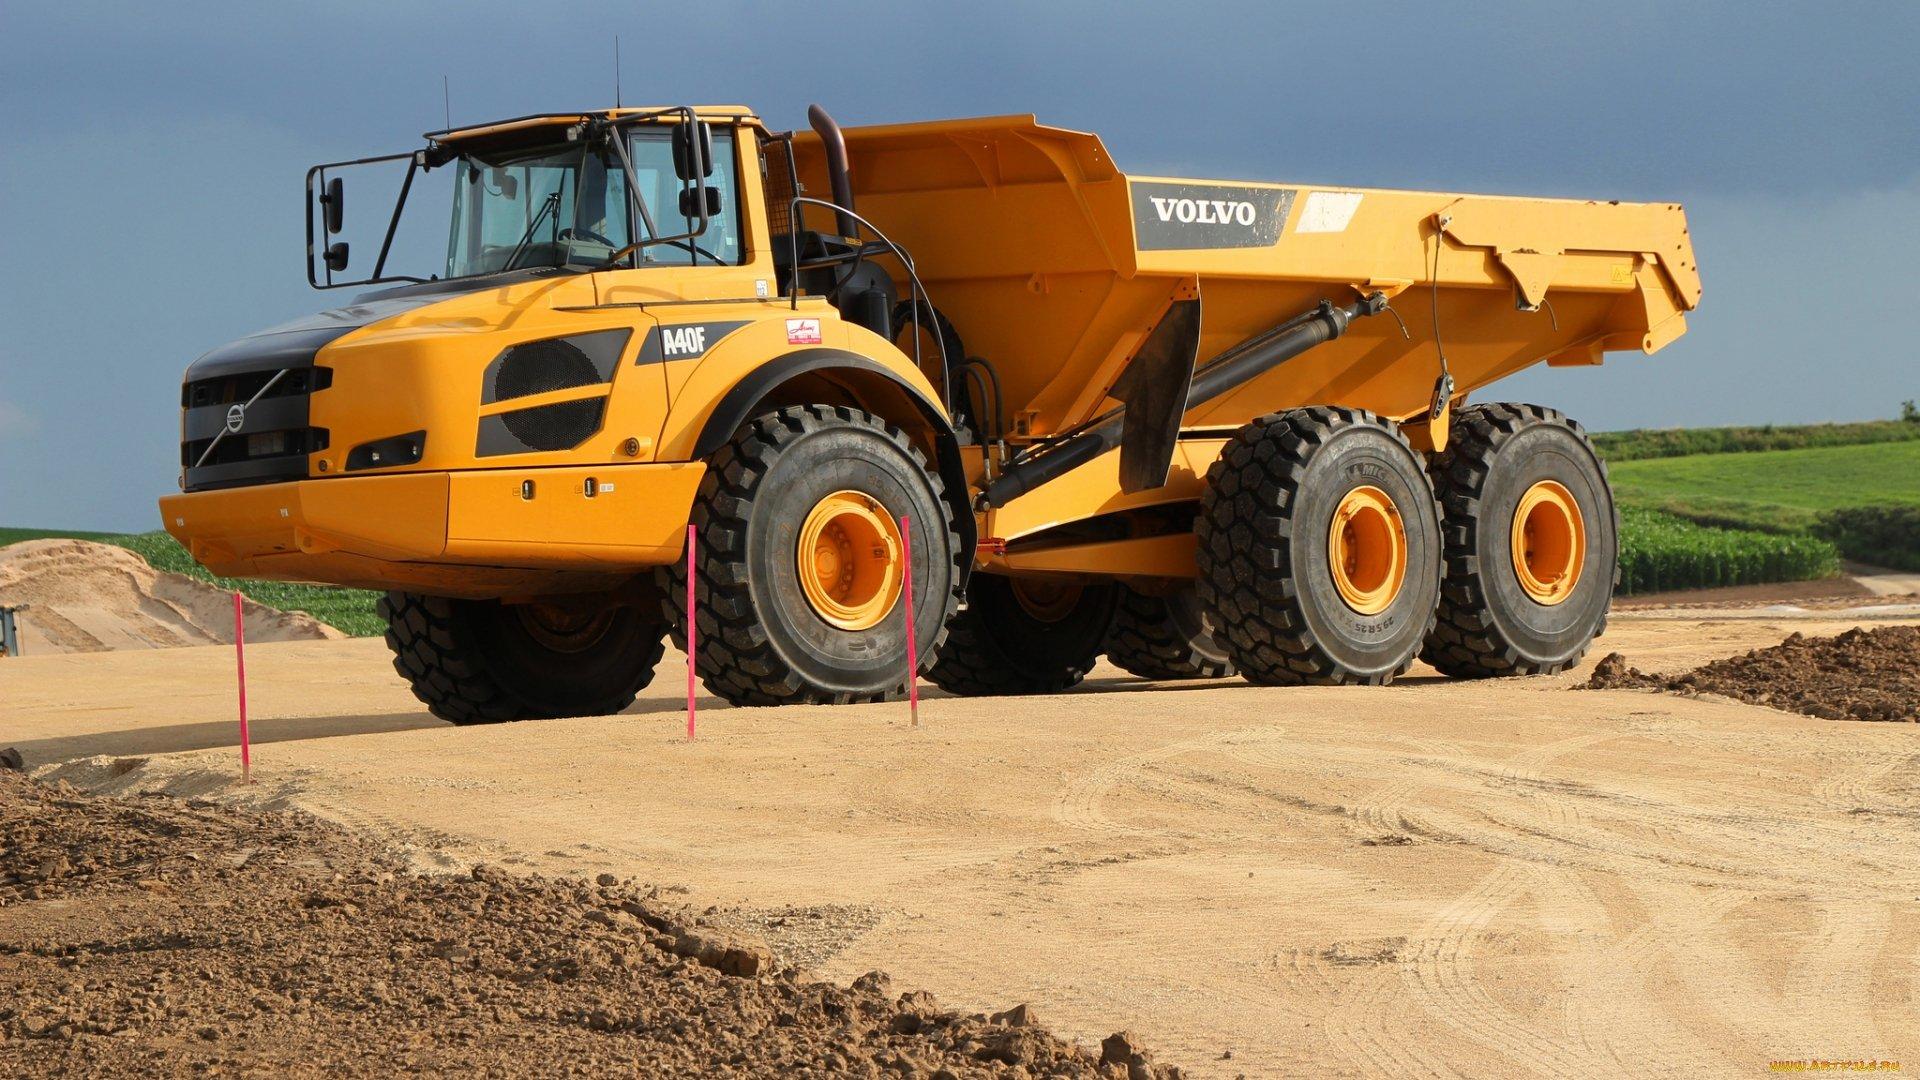 Volvo Machinery truck havey mine machine wallpaper 1920x1080